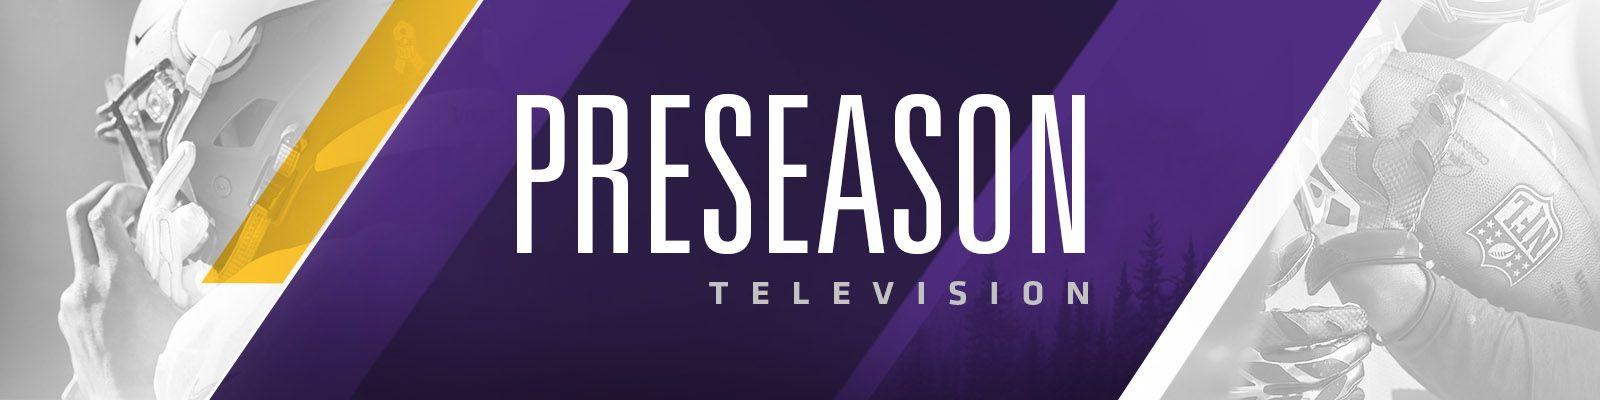 Preseason_1600x400